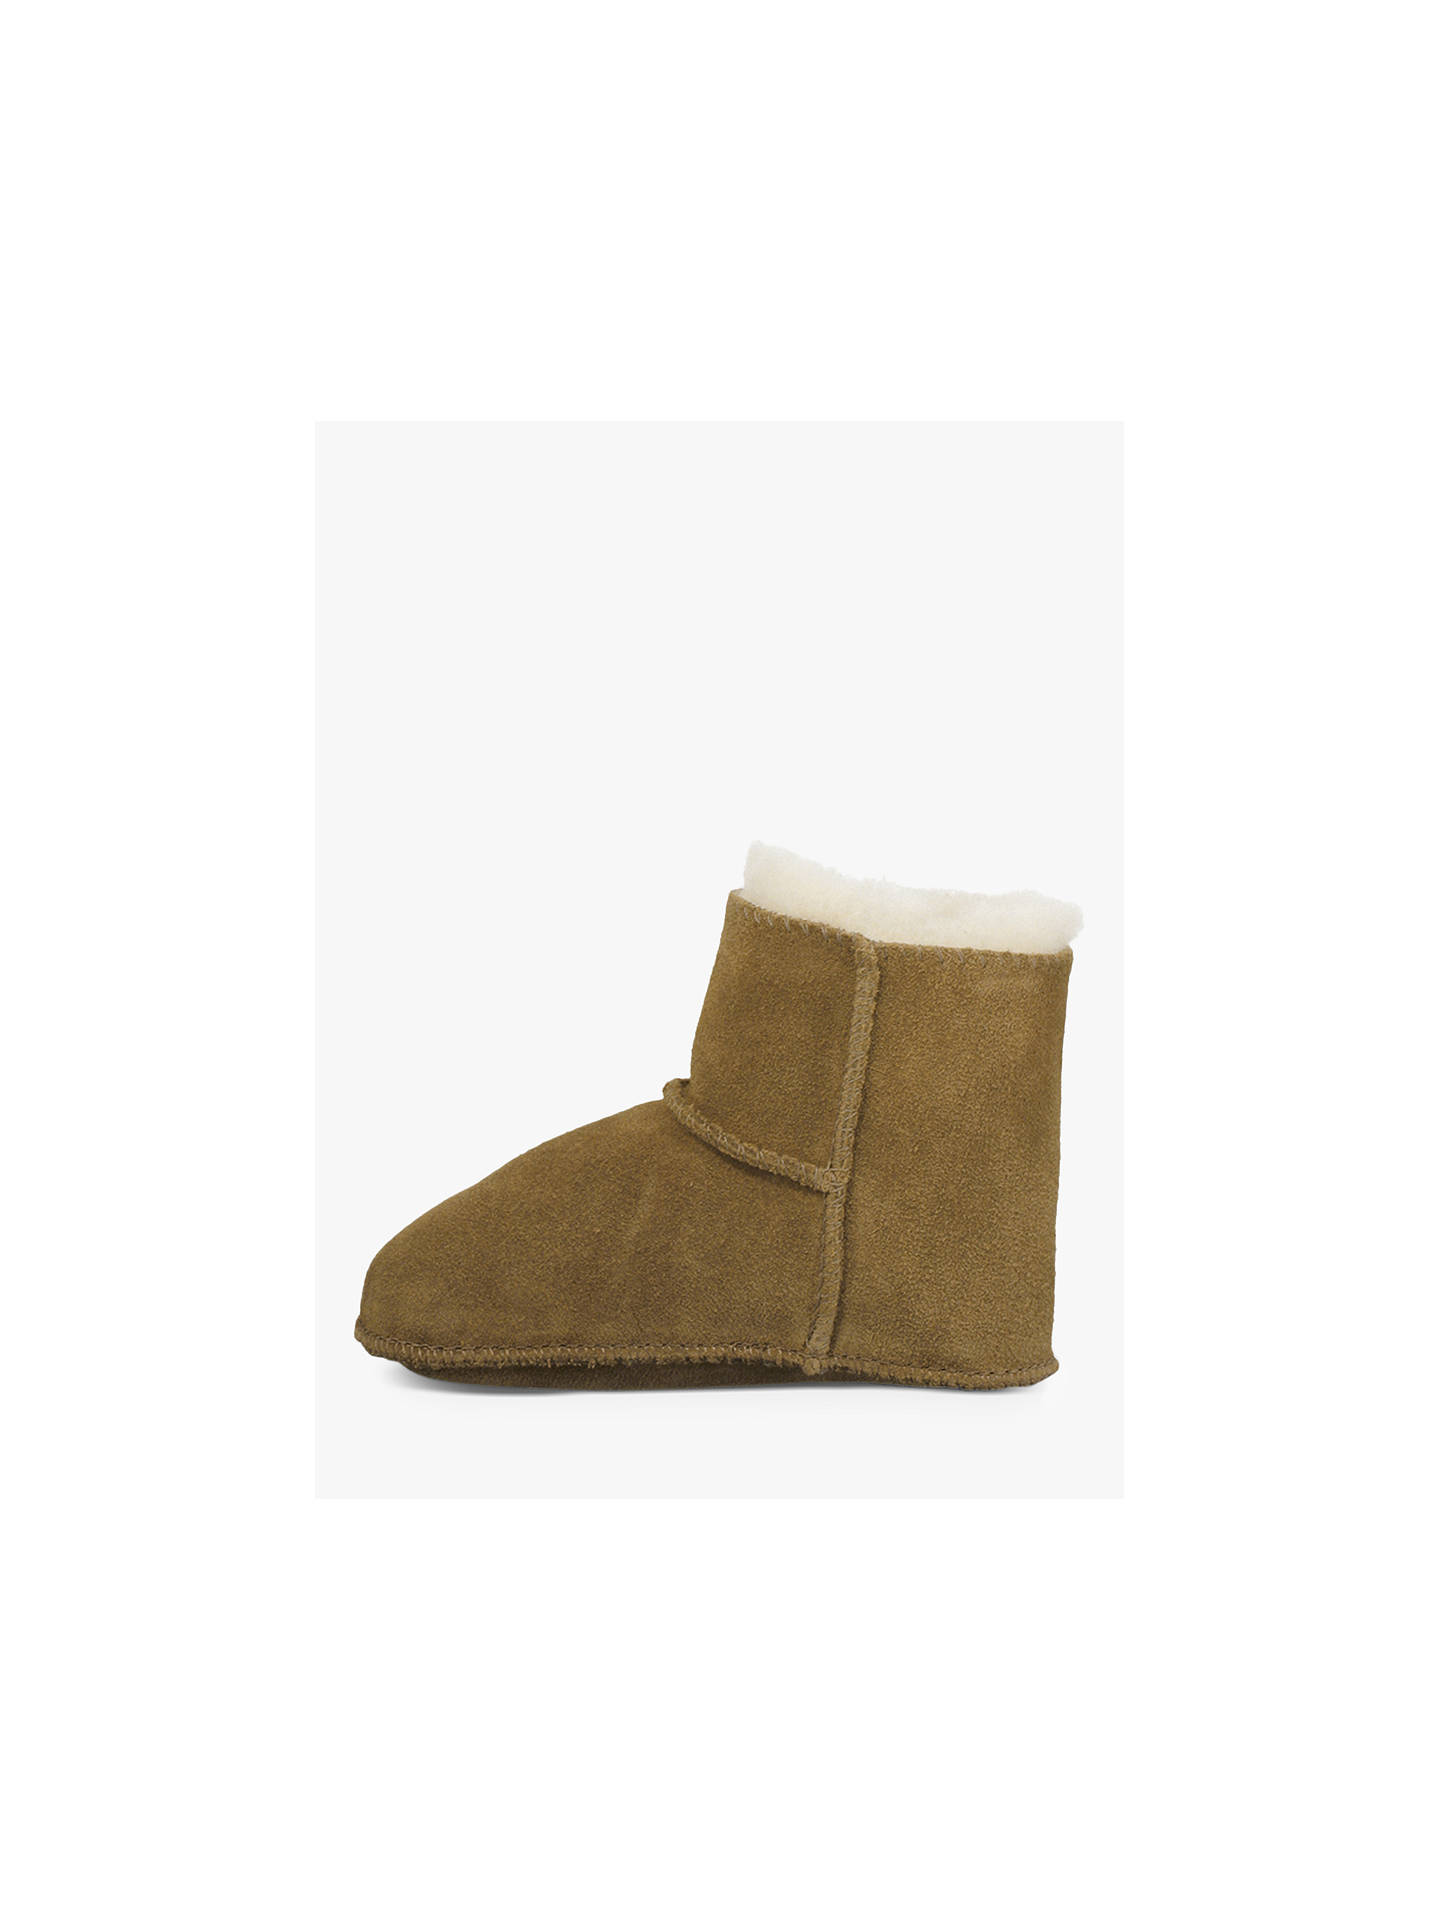 da68664b09f5 ... Buy UGG Children s Erin Boots